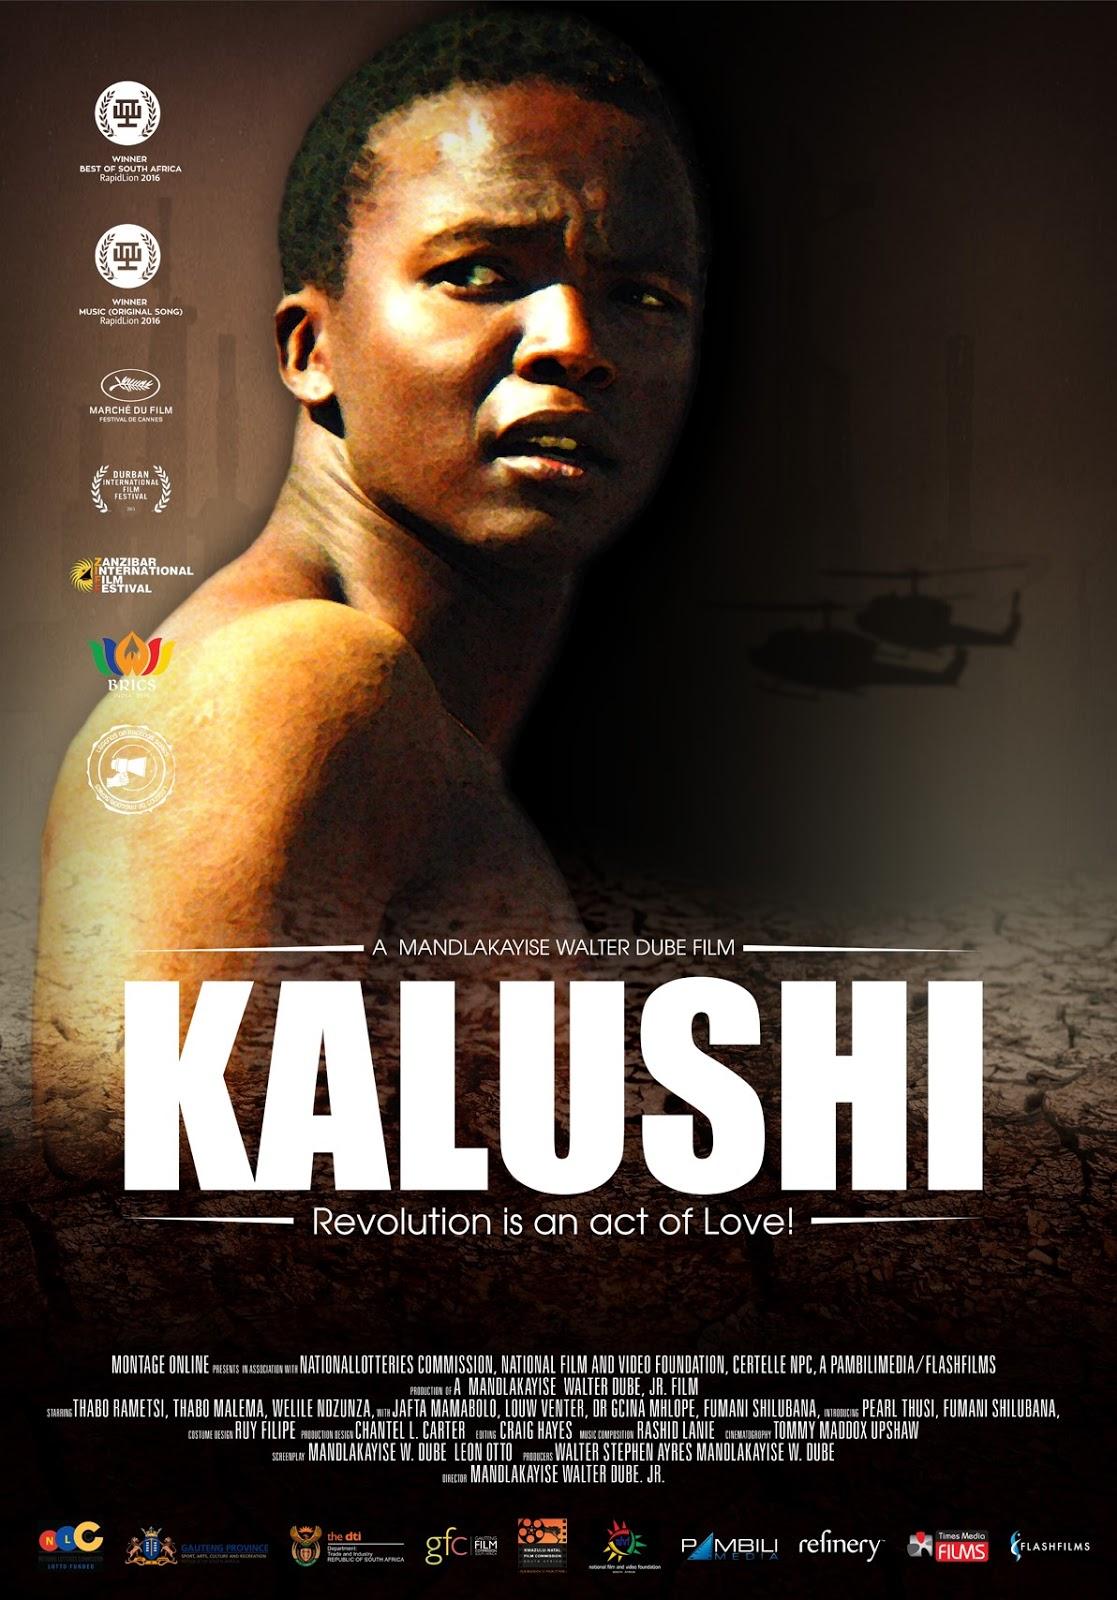 Durban Film Festival DIFF 2016